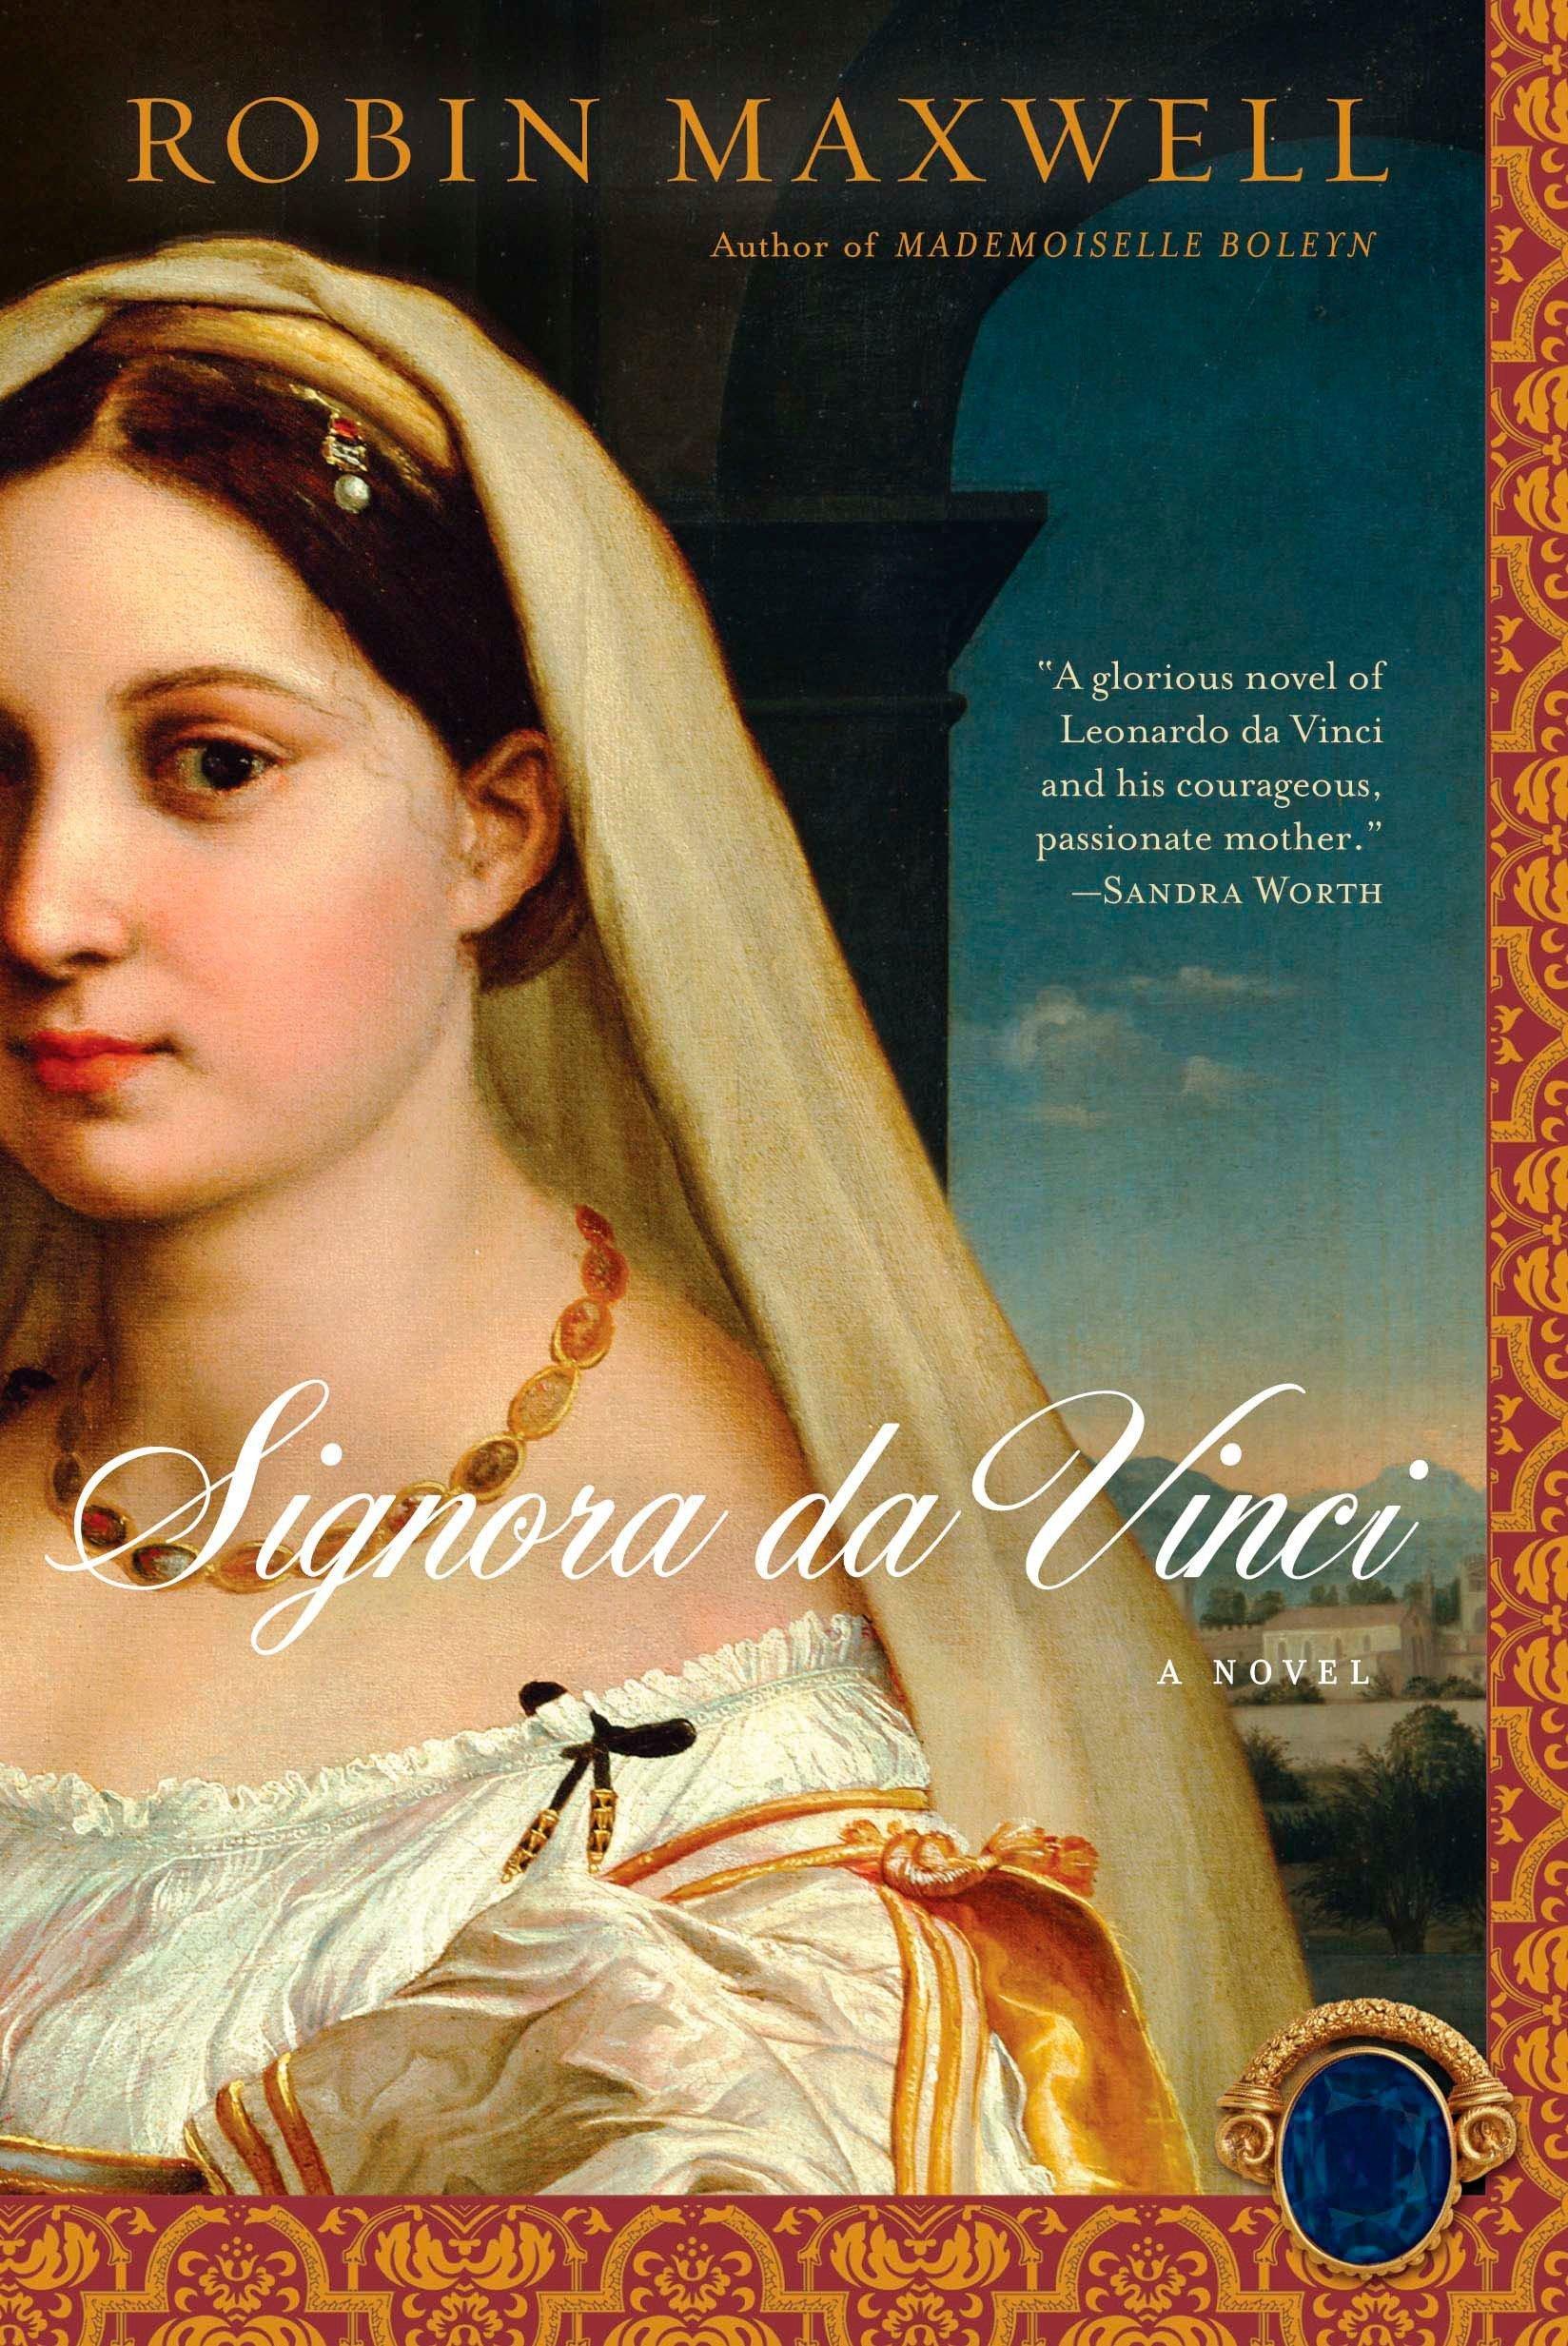 Signora Da Vinci ebook by Robin Maxwell